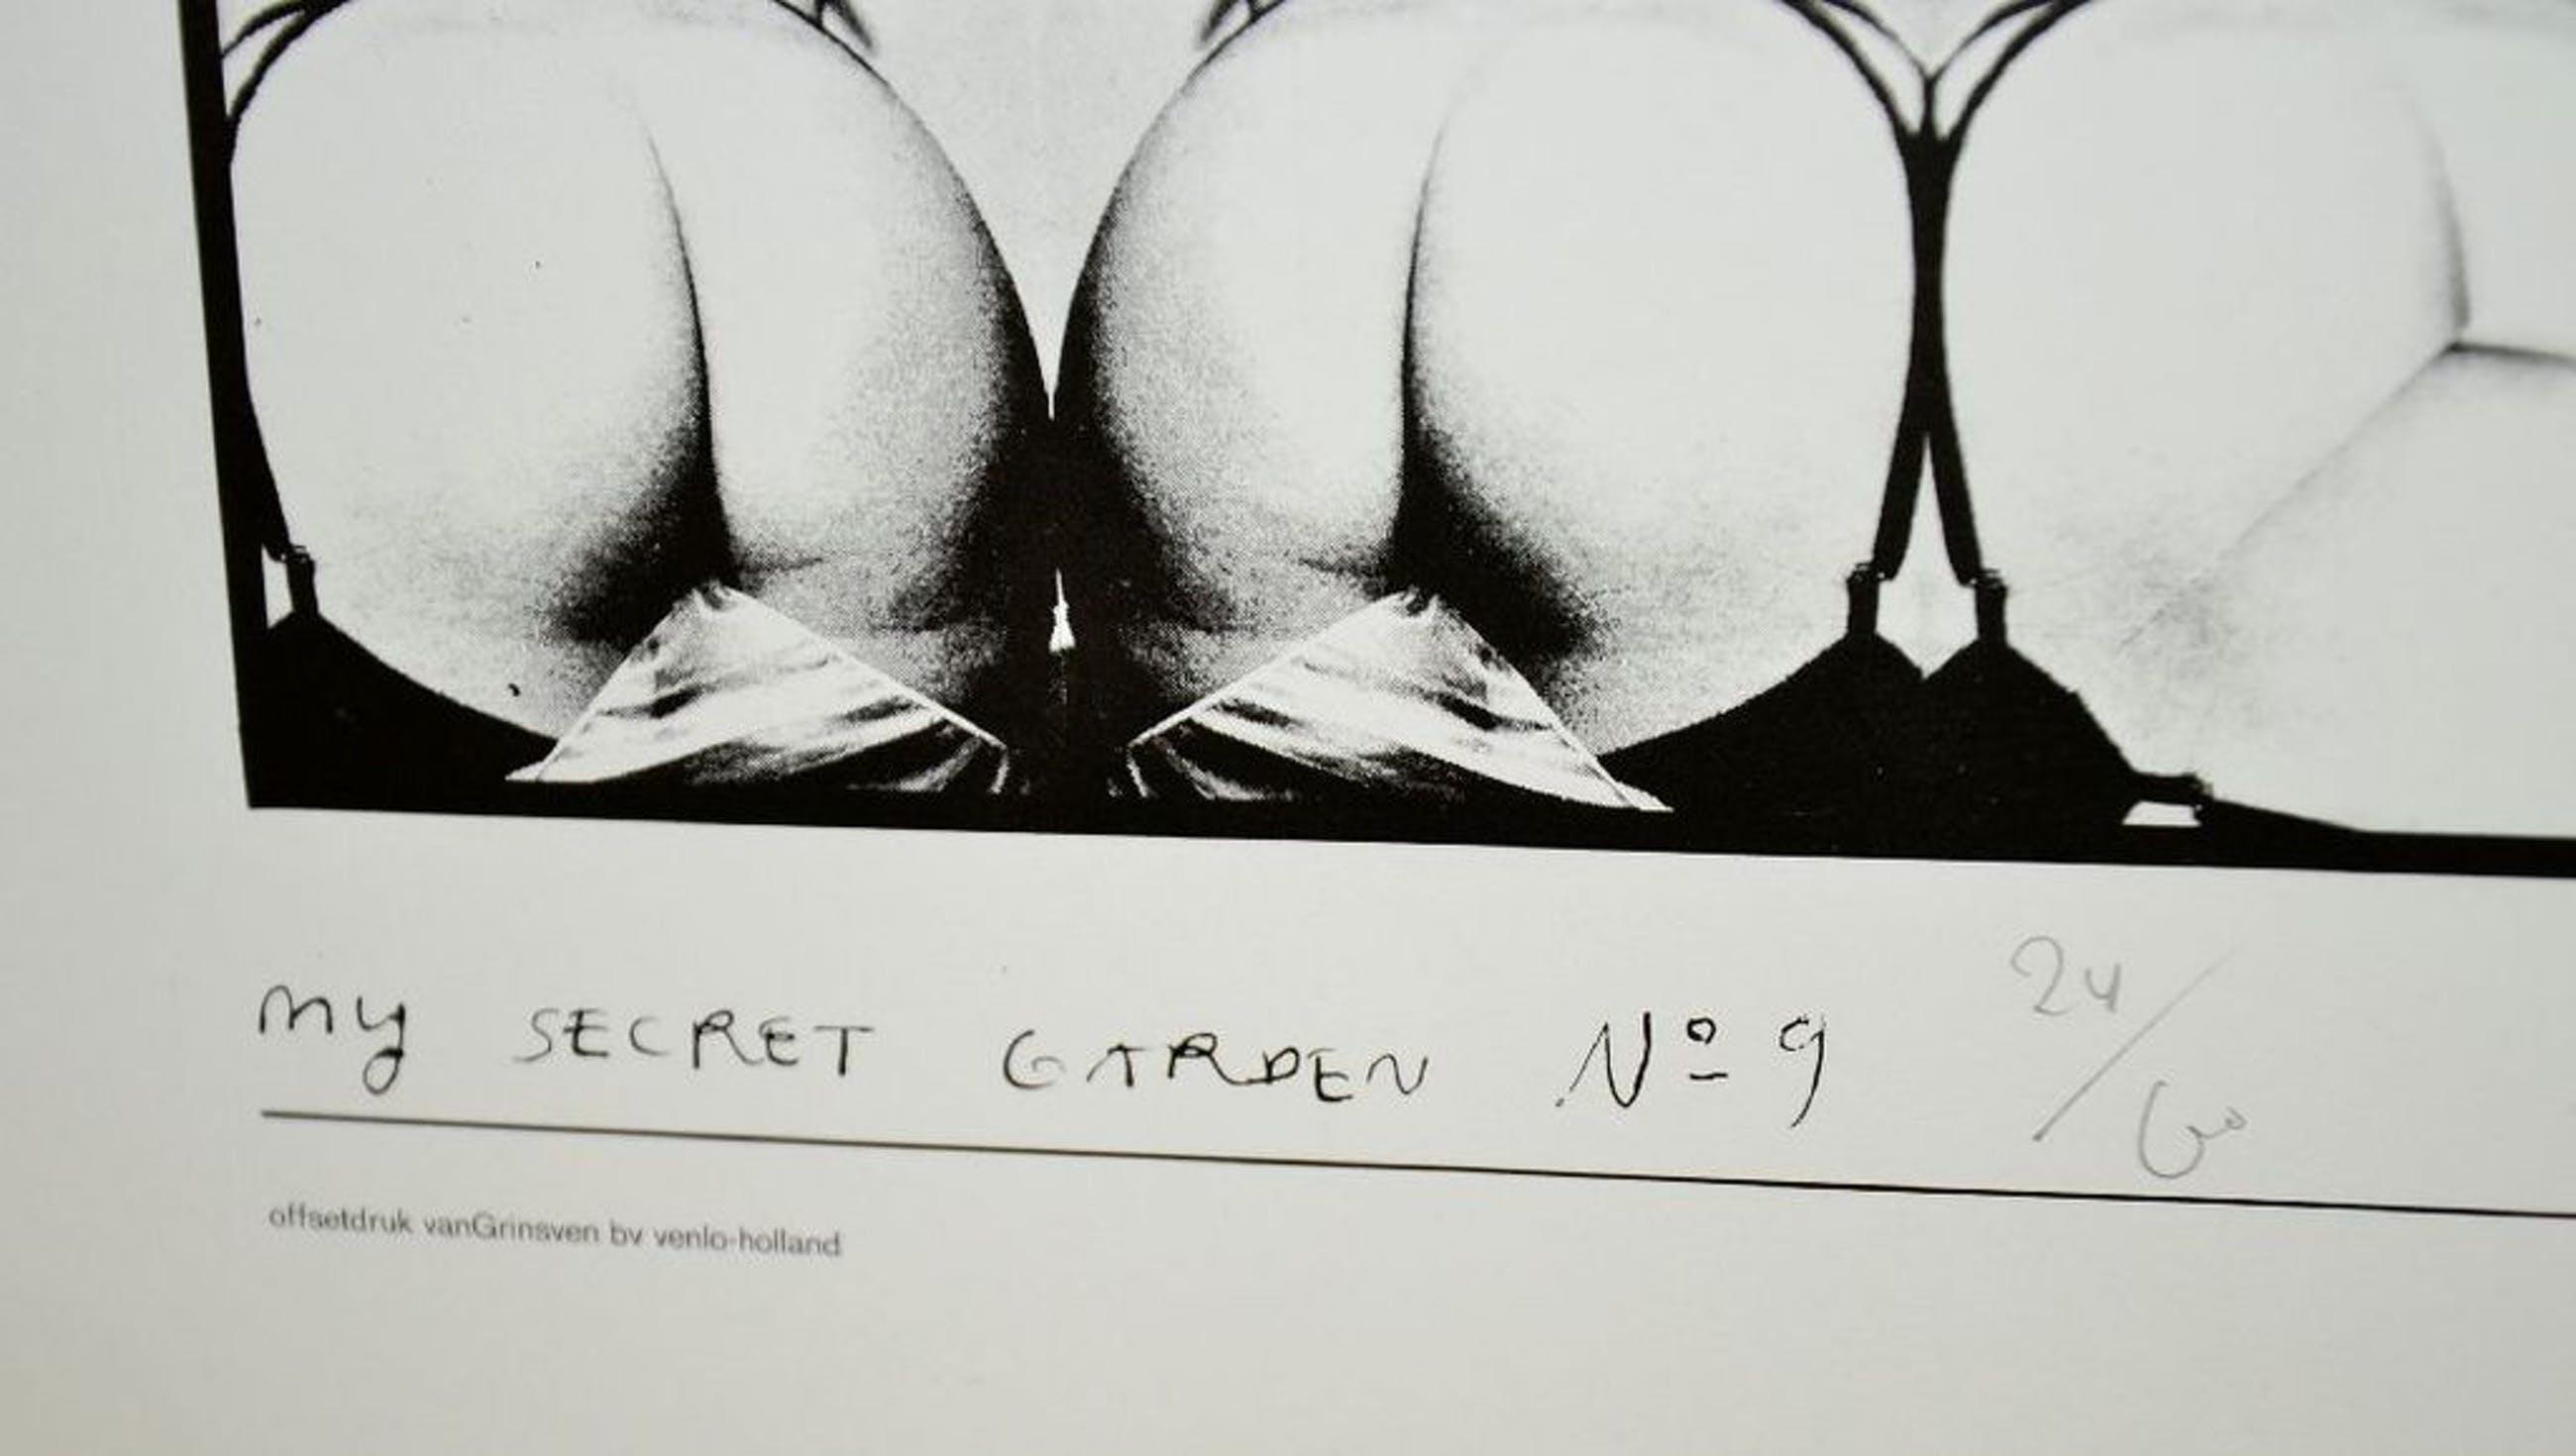 Shinkichi Tajiri: Offset Techniek My Secret Garden No. 9 kopen? Bied vanaf 1!